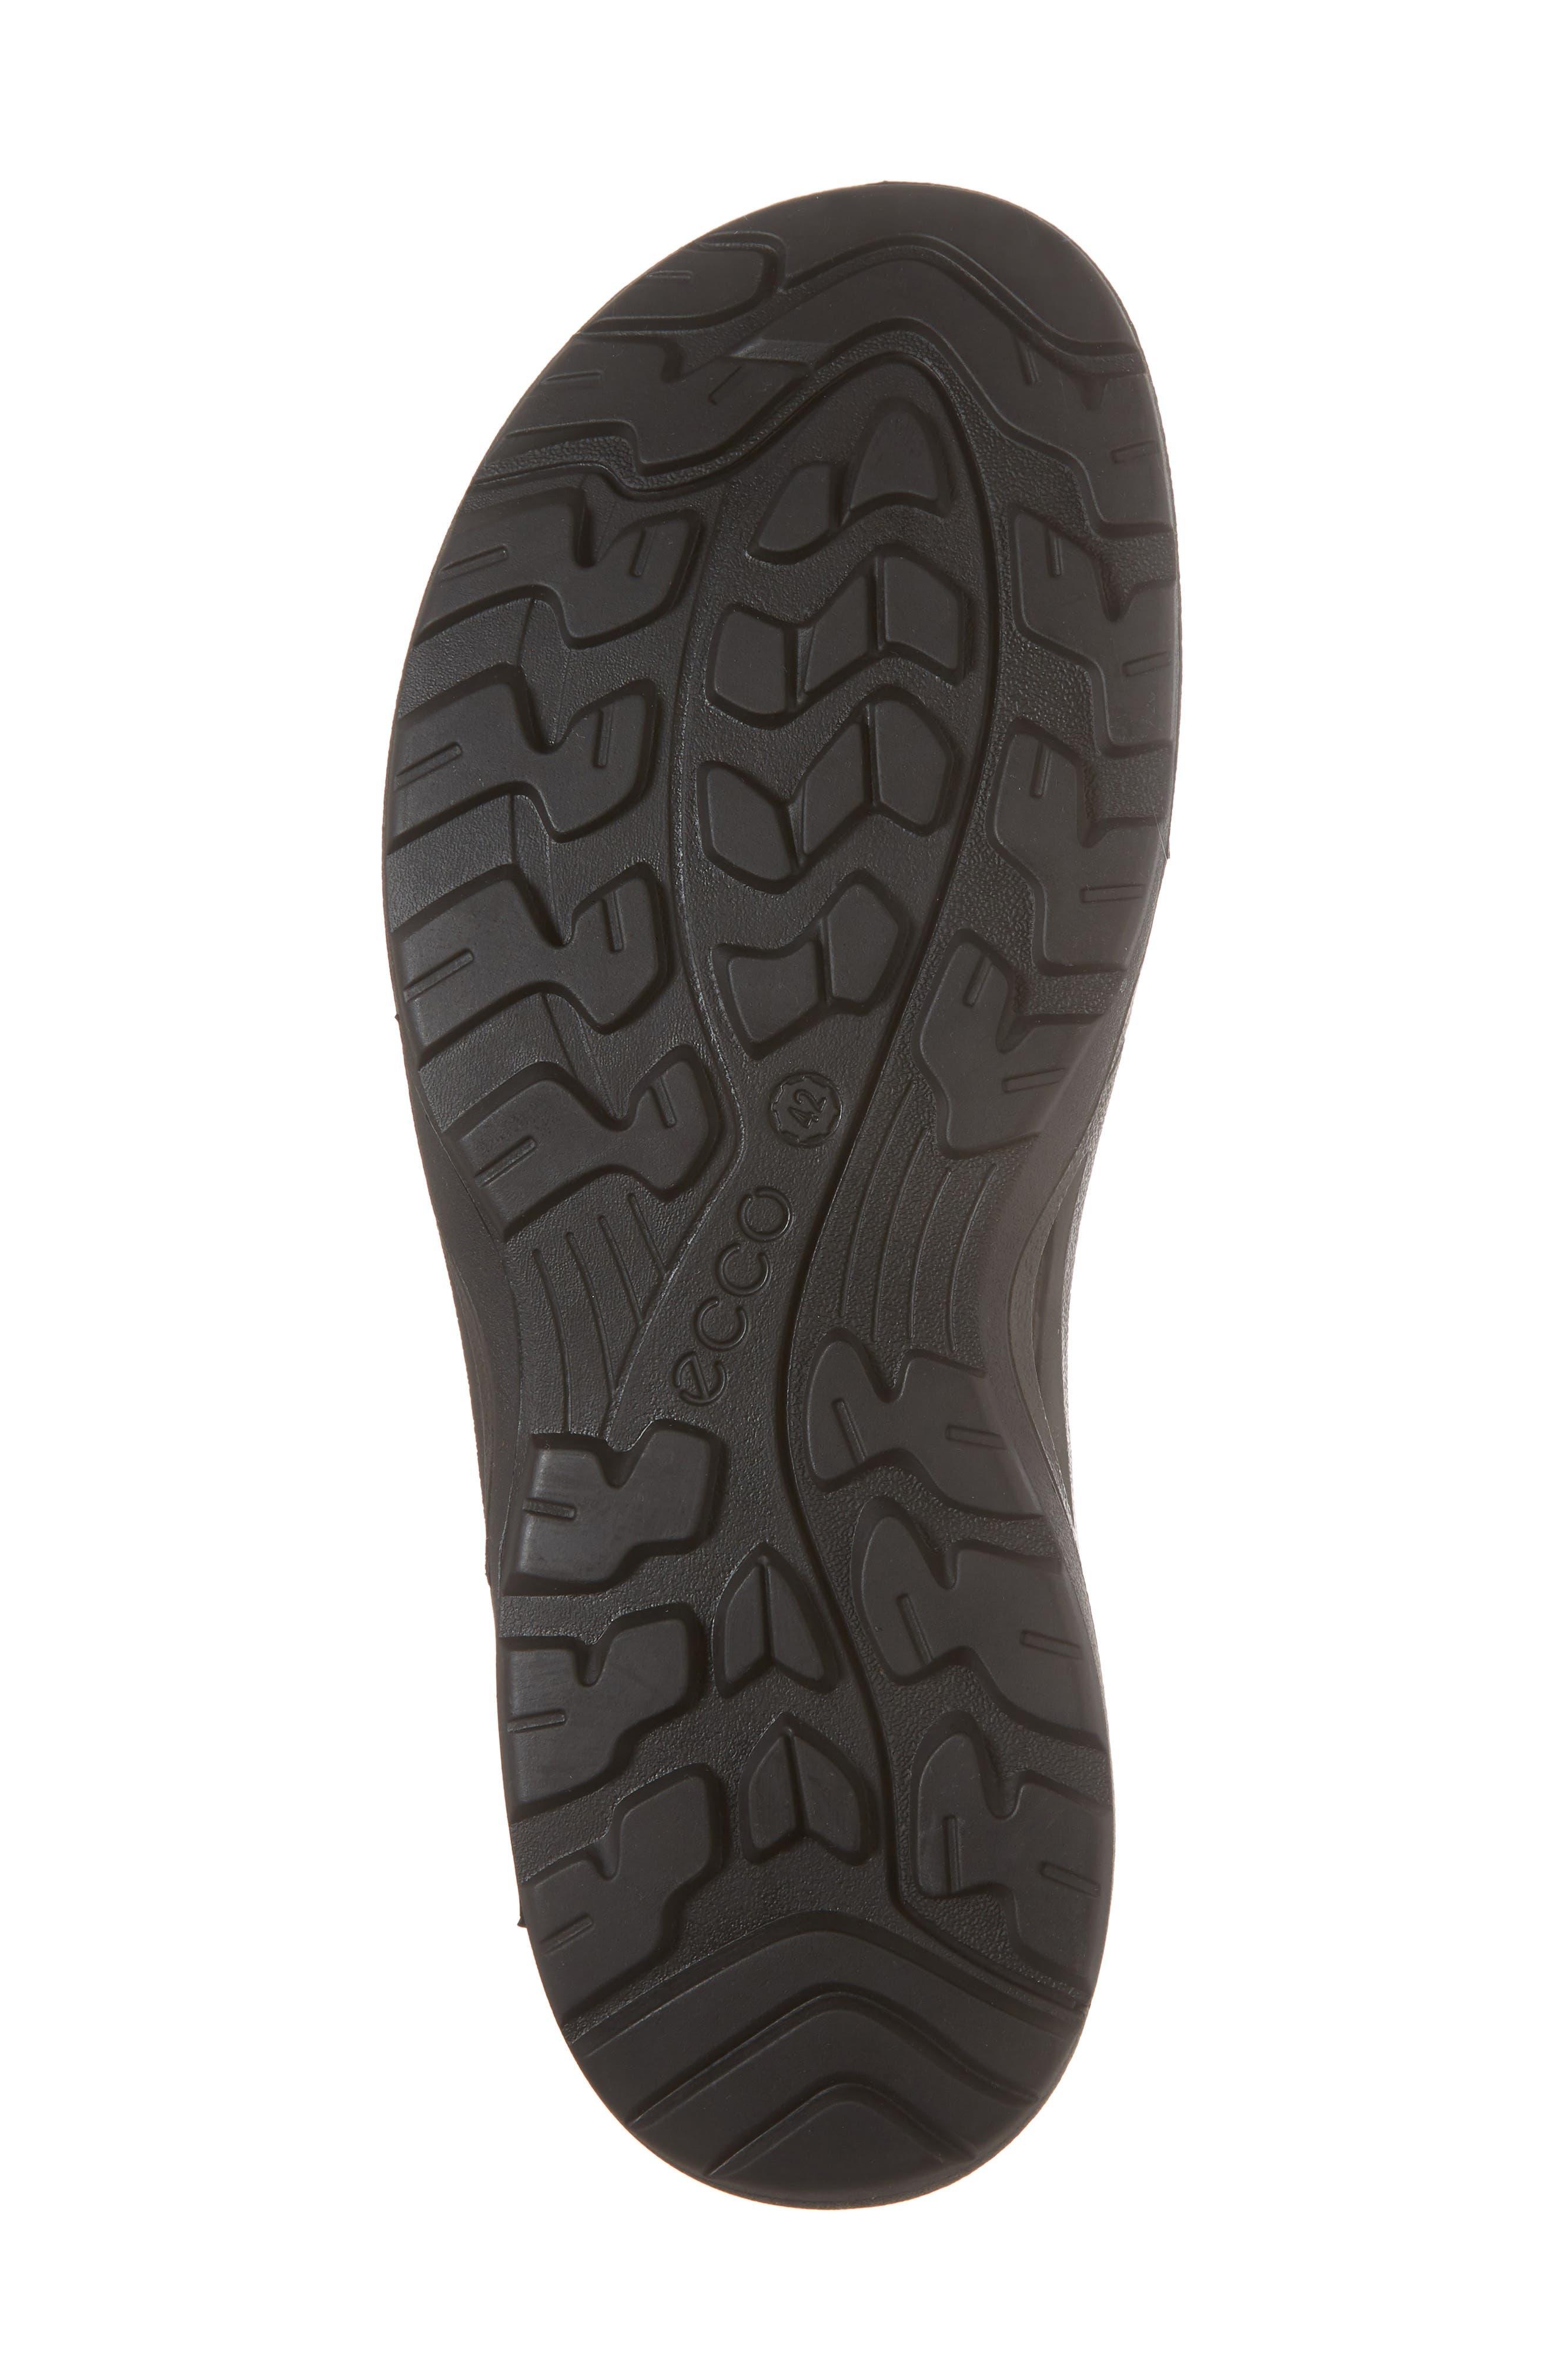 BIOM Delta Fisherman Sandal,                             Alternate thumbnail 6, color,                             Coffee Leather